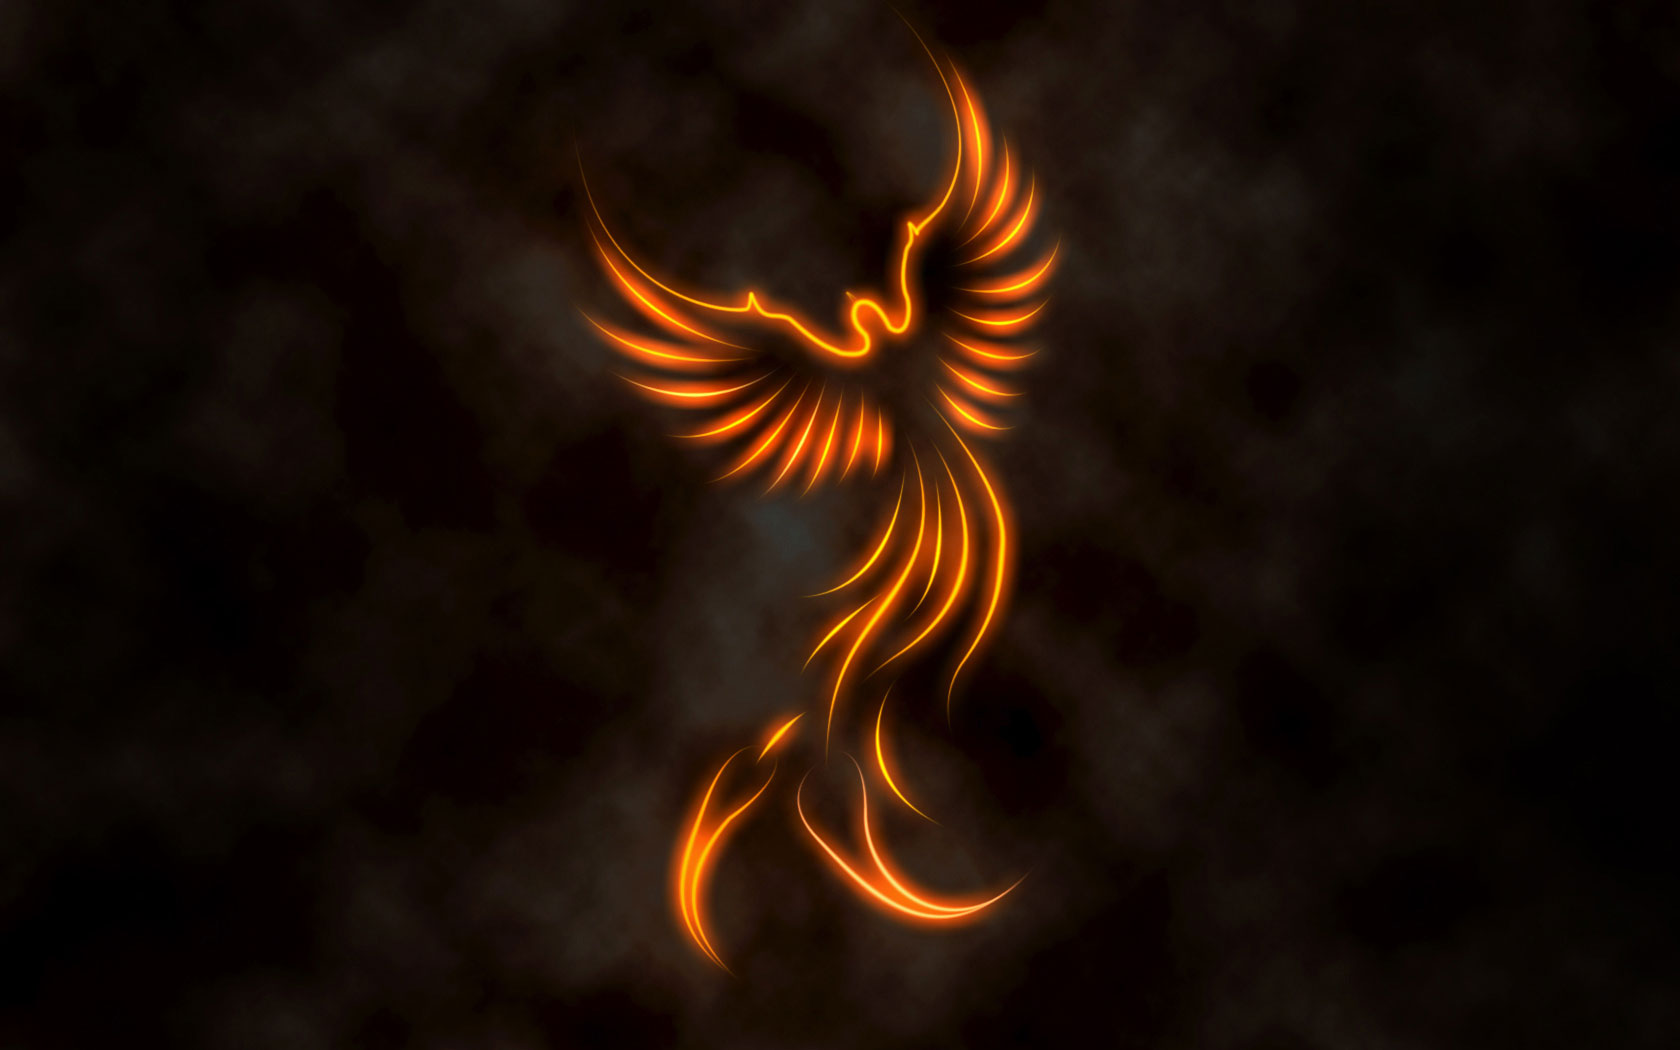 fire phoenix Computer Wallpapers Desktop Backgrounds 1680x1050 ID 1680x1050